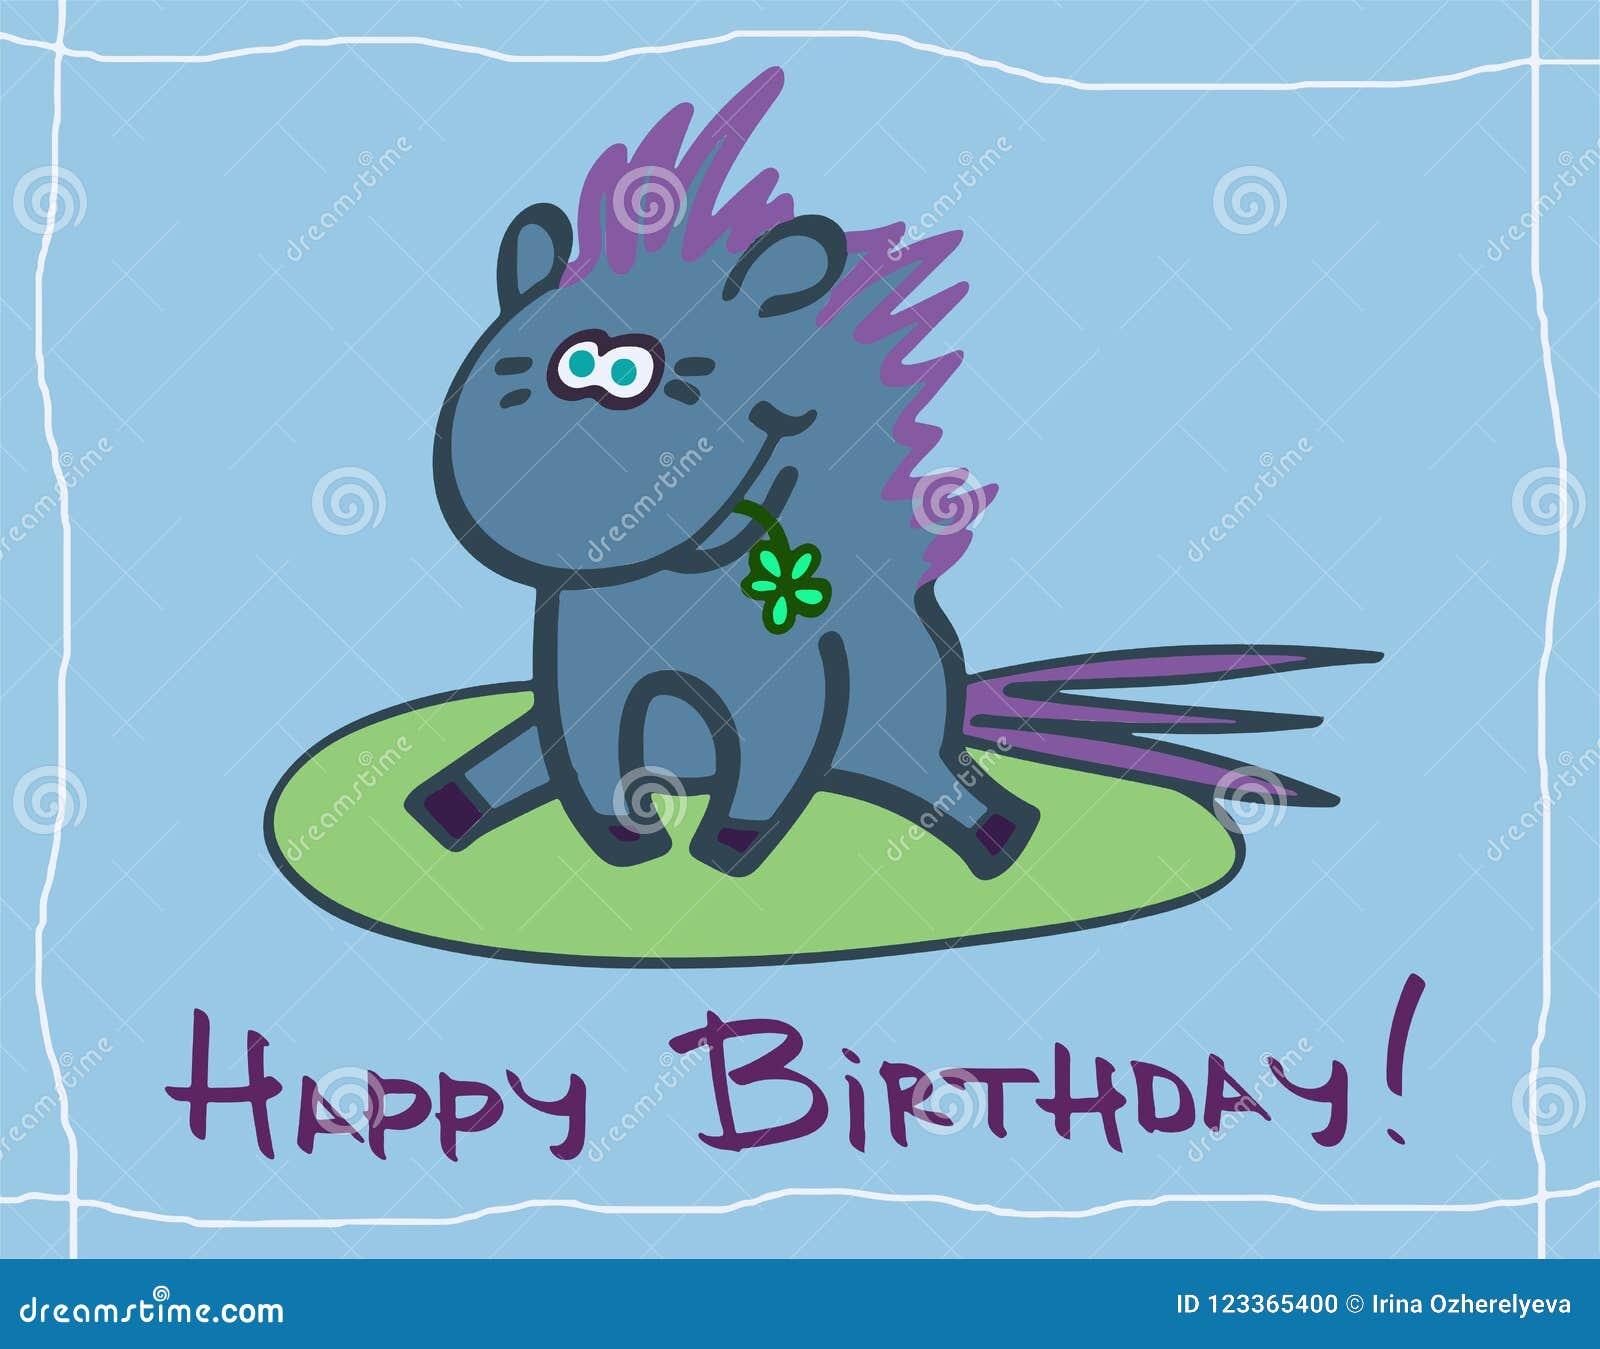 Happy Birthday Greeting Card Stock Illustration Illustration Of Funny Baby 123365400